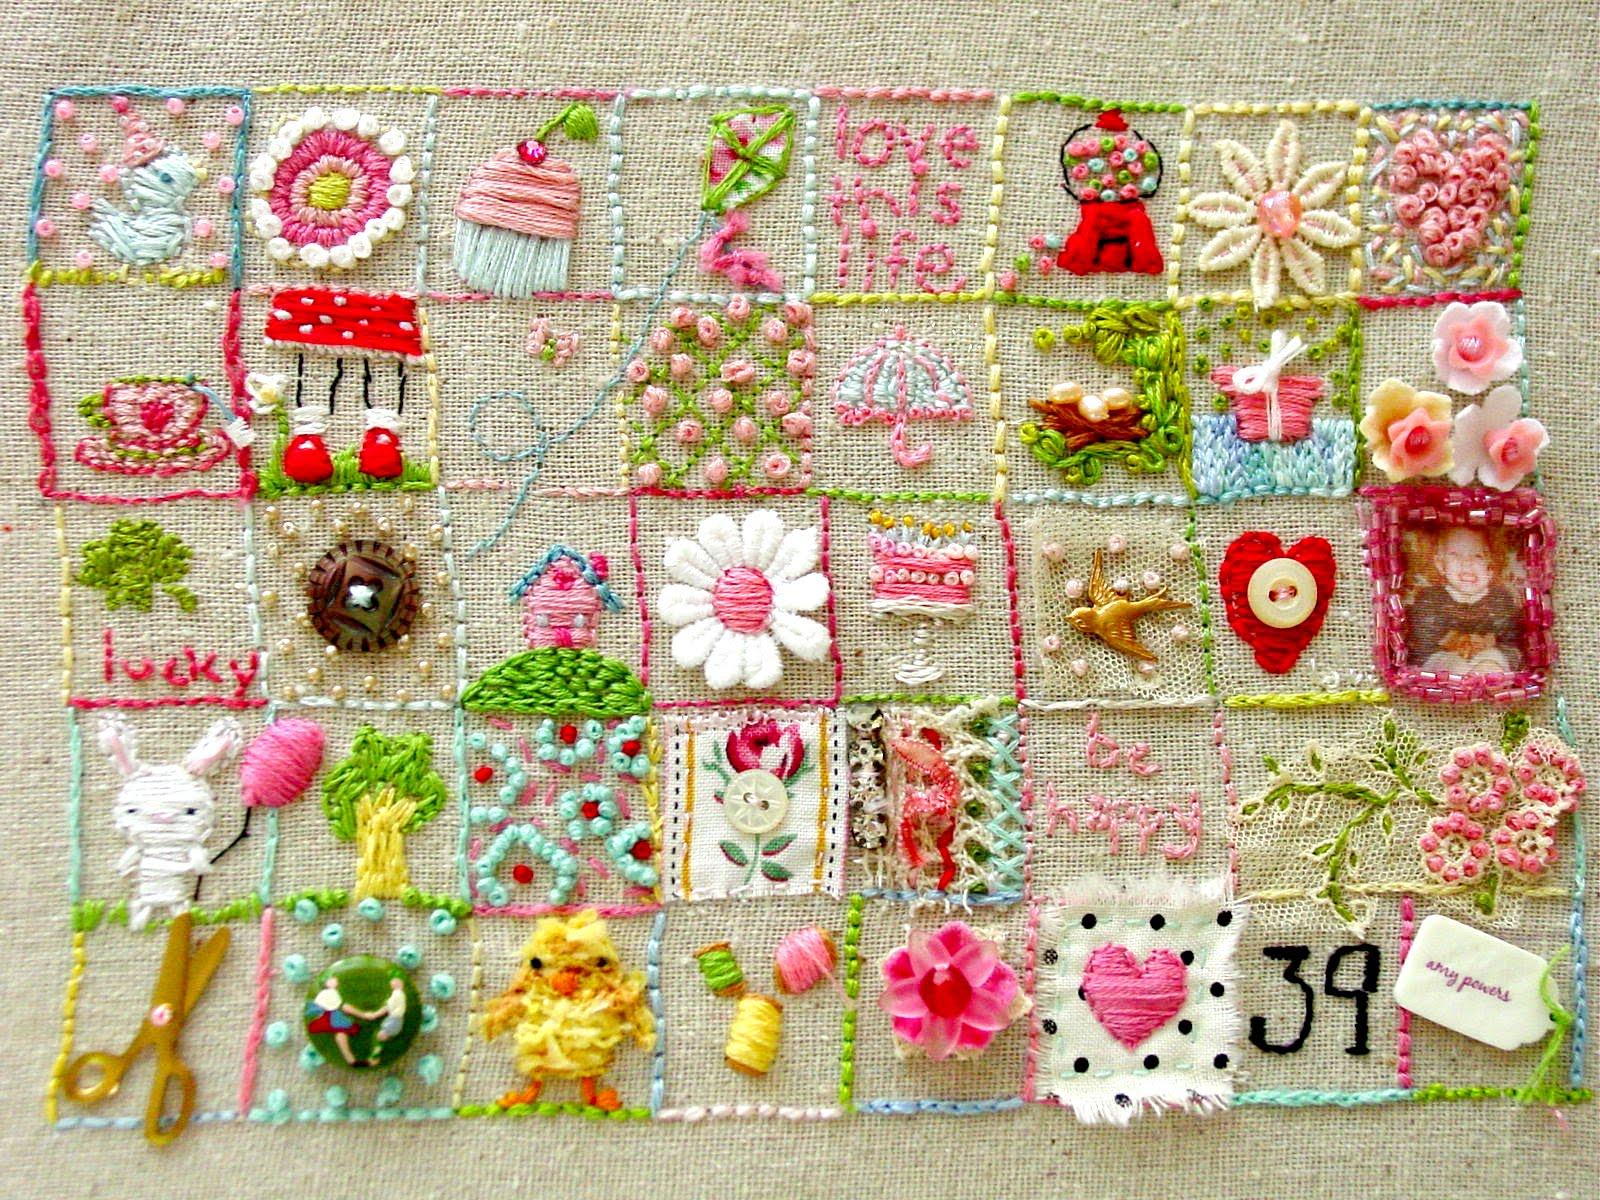 Embroidery sampler noelle o designs